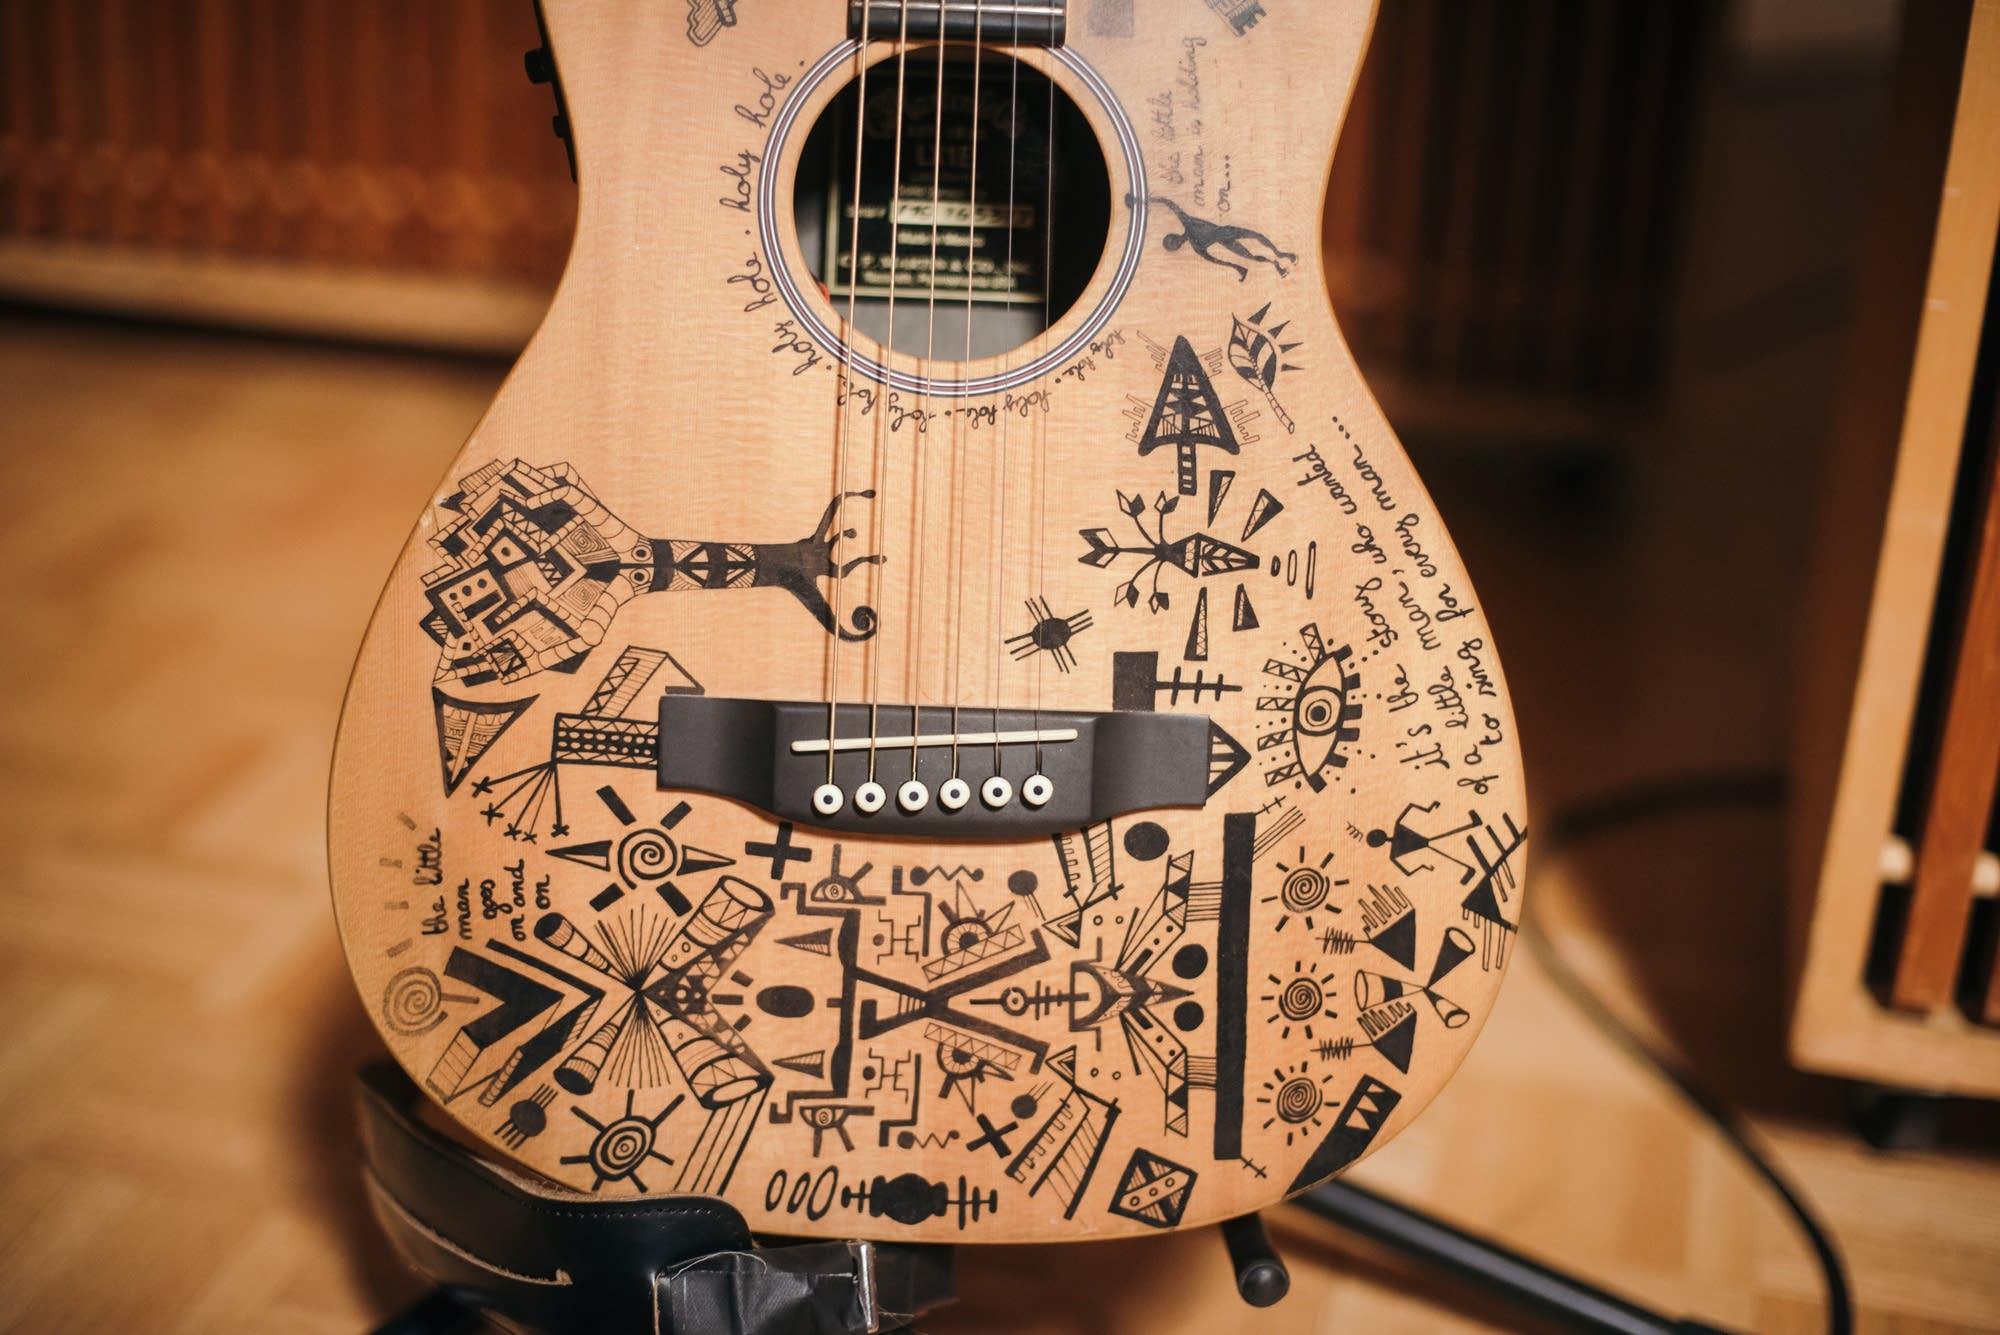 Jain's guitar